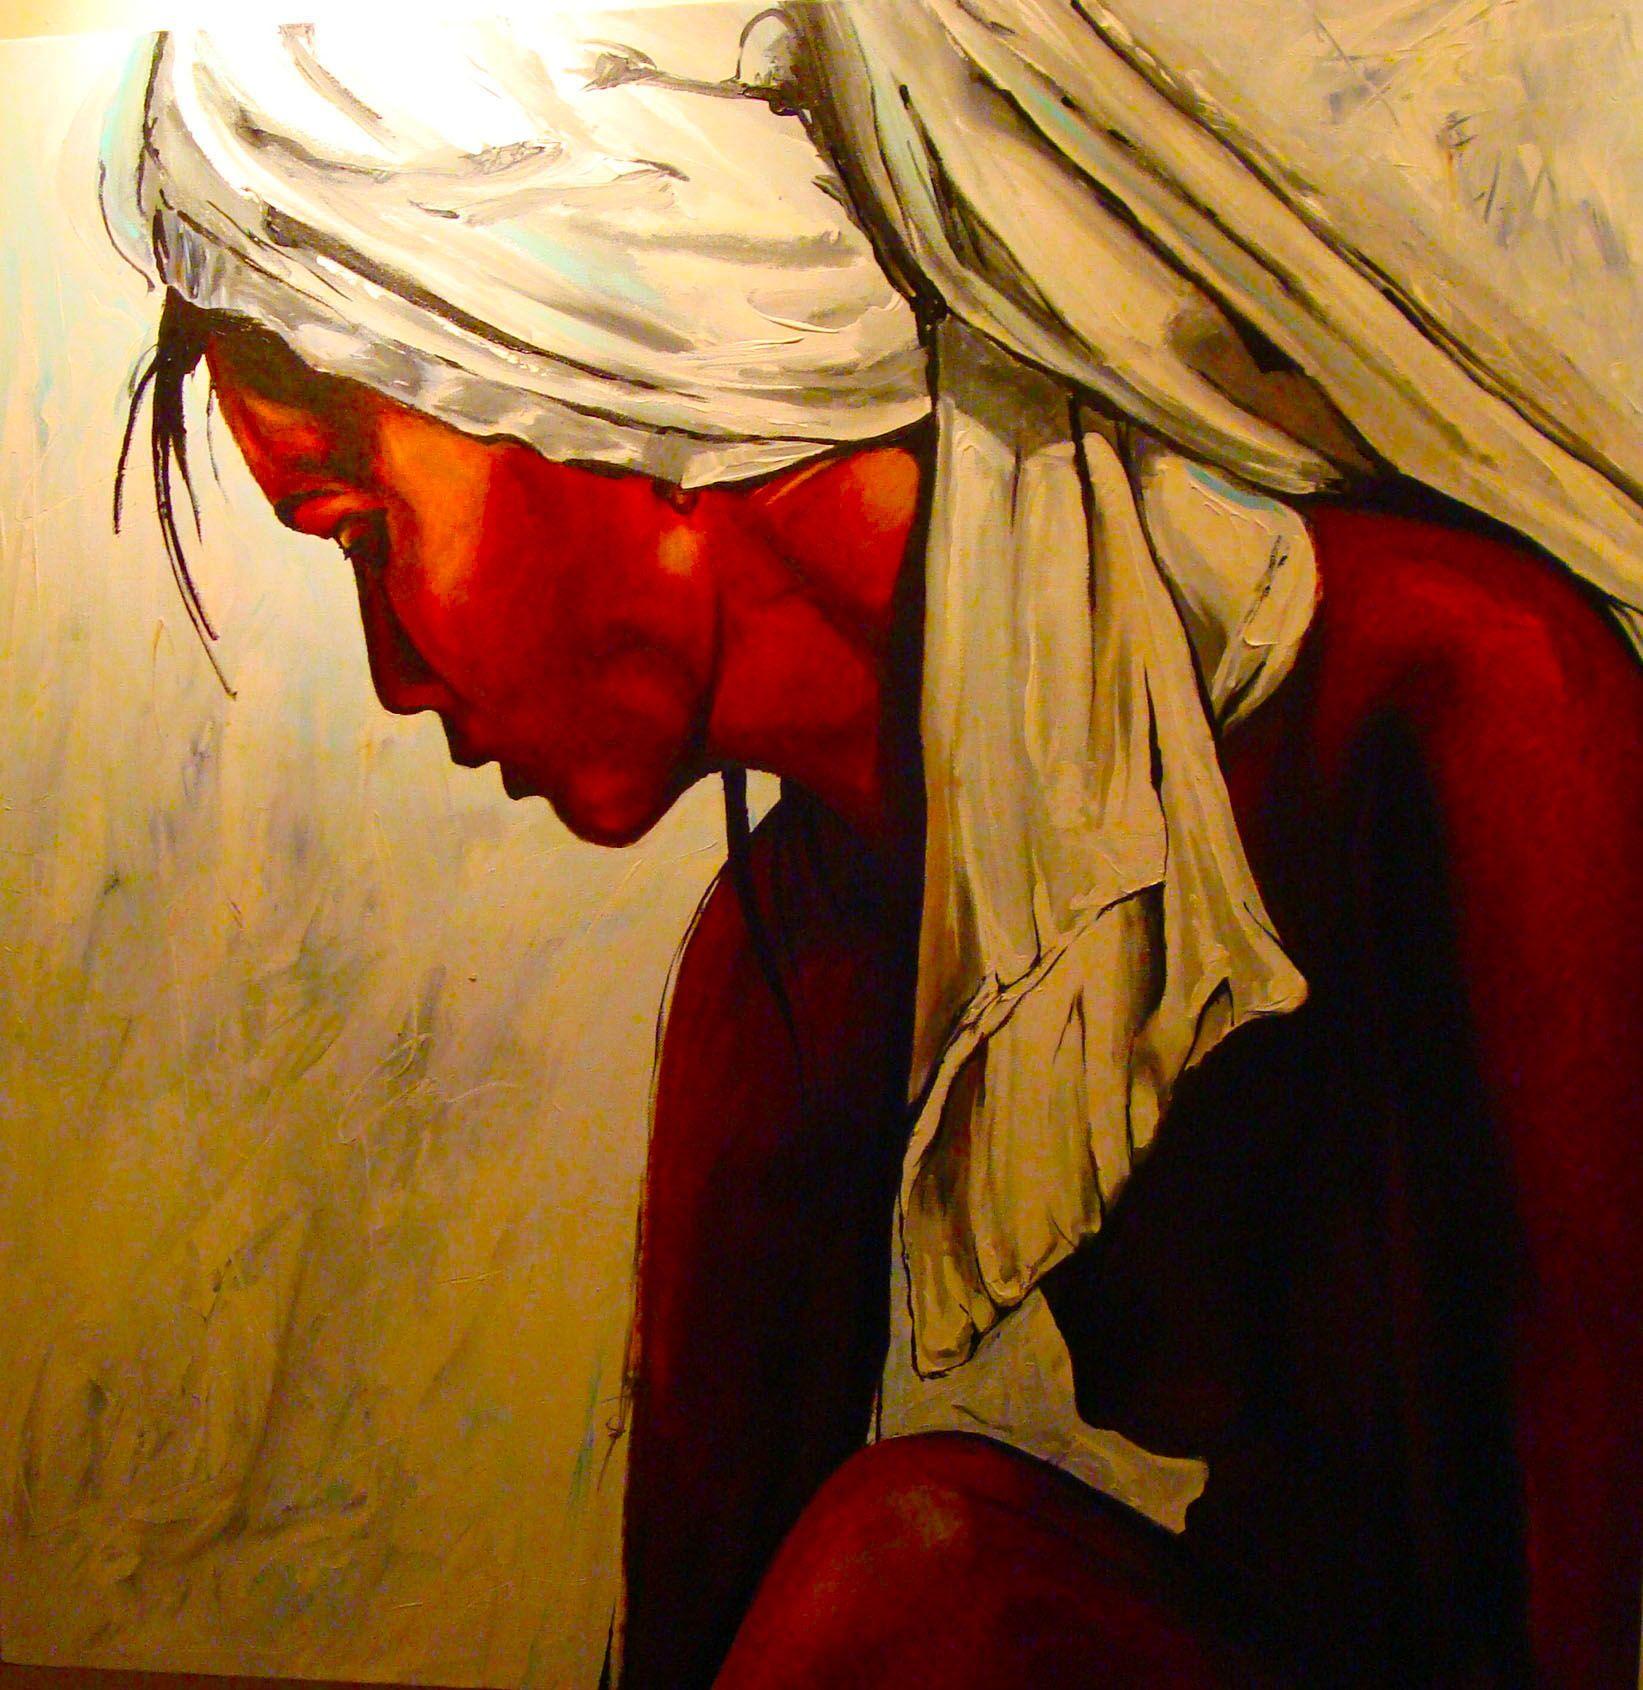 Enamorada 100 x 100 cm Patrick van Haren